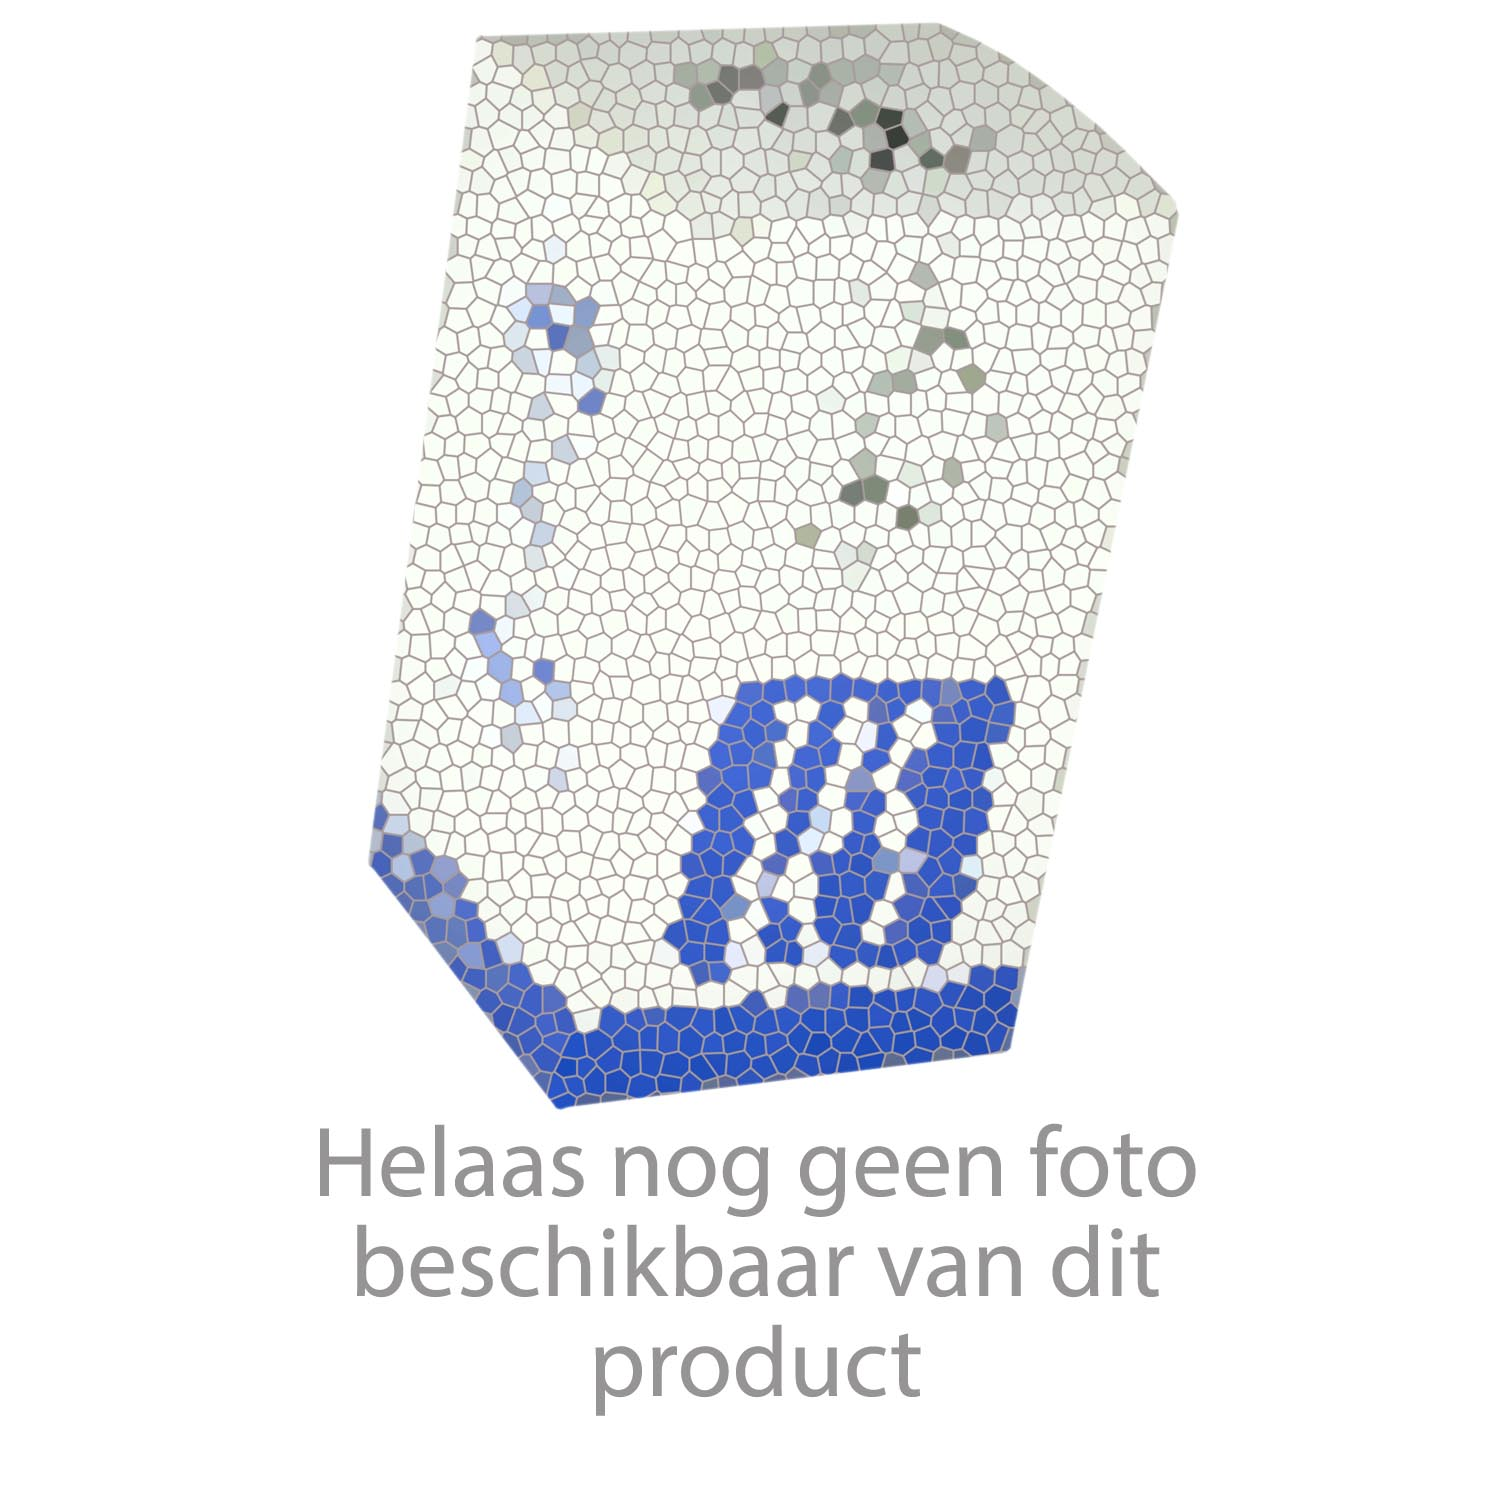 Grohe onderdelen Allure Brilliant 3-Gats Wastafelmengkraan Wand 220 Mm 20348000